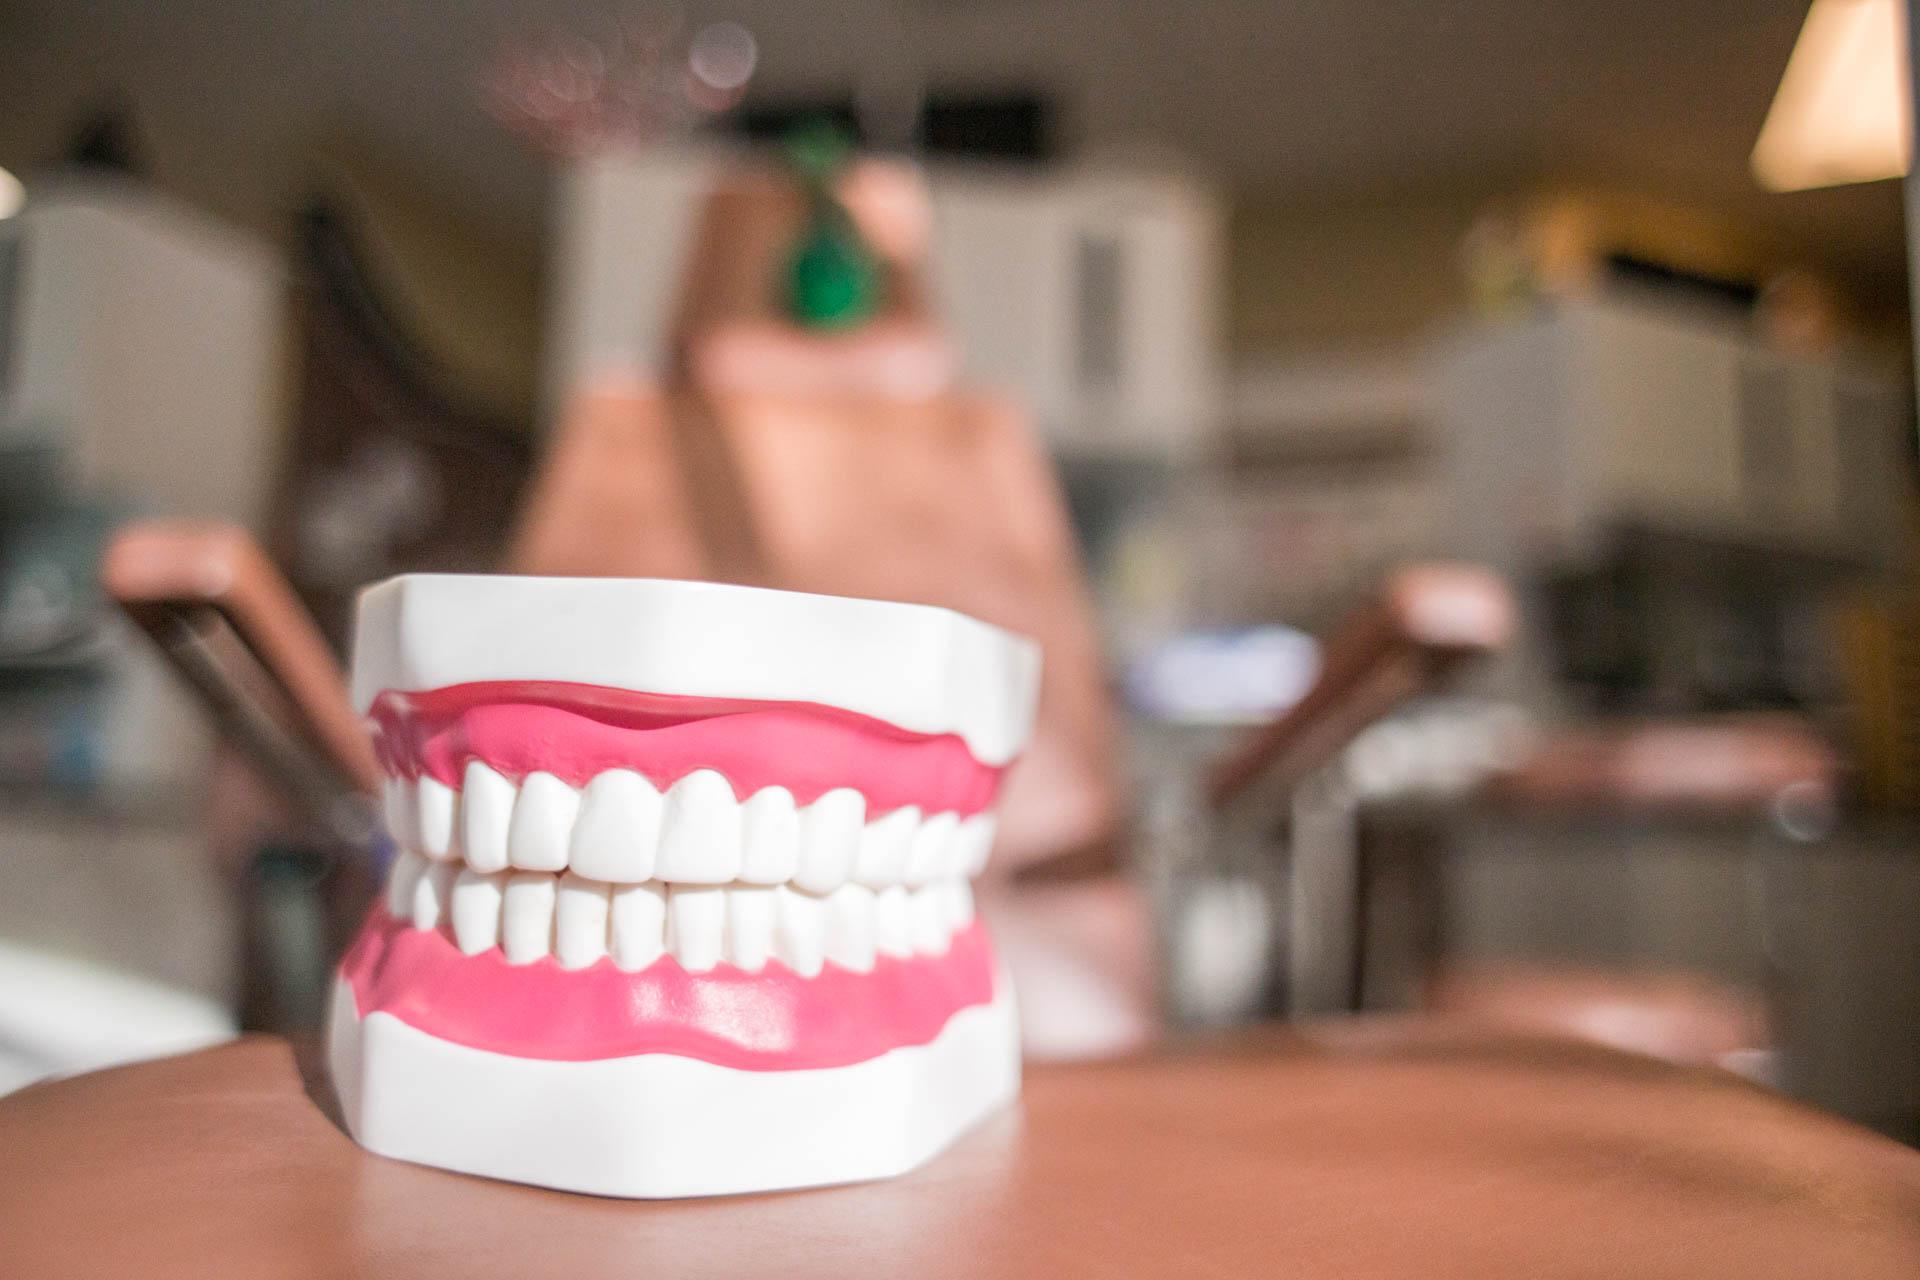 Advanced Pediatric Dentistry Pasco hermiston kids Dentist and orthodontist braces care pediatric children walla walla Tri-cities tricities richmond hermiston pasco Kennewick-33.jpg